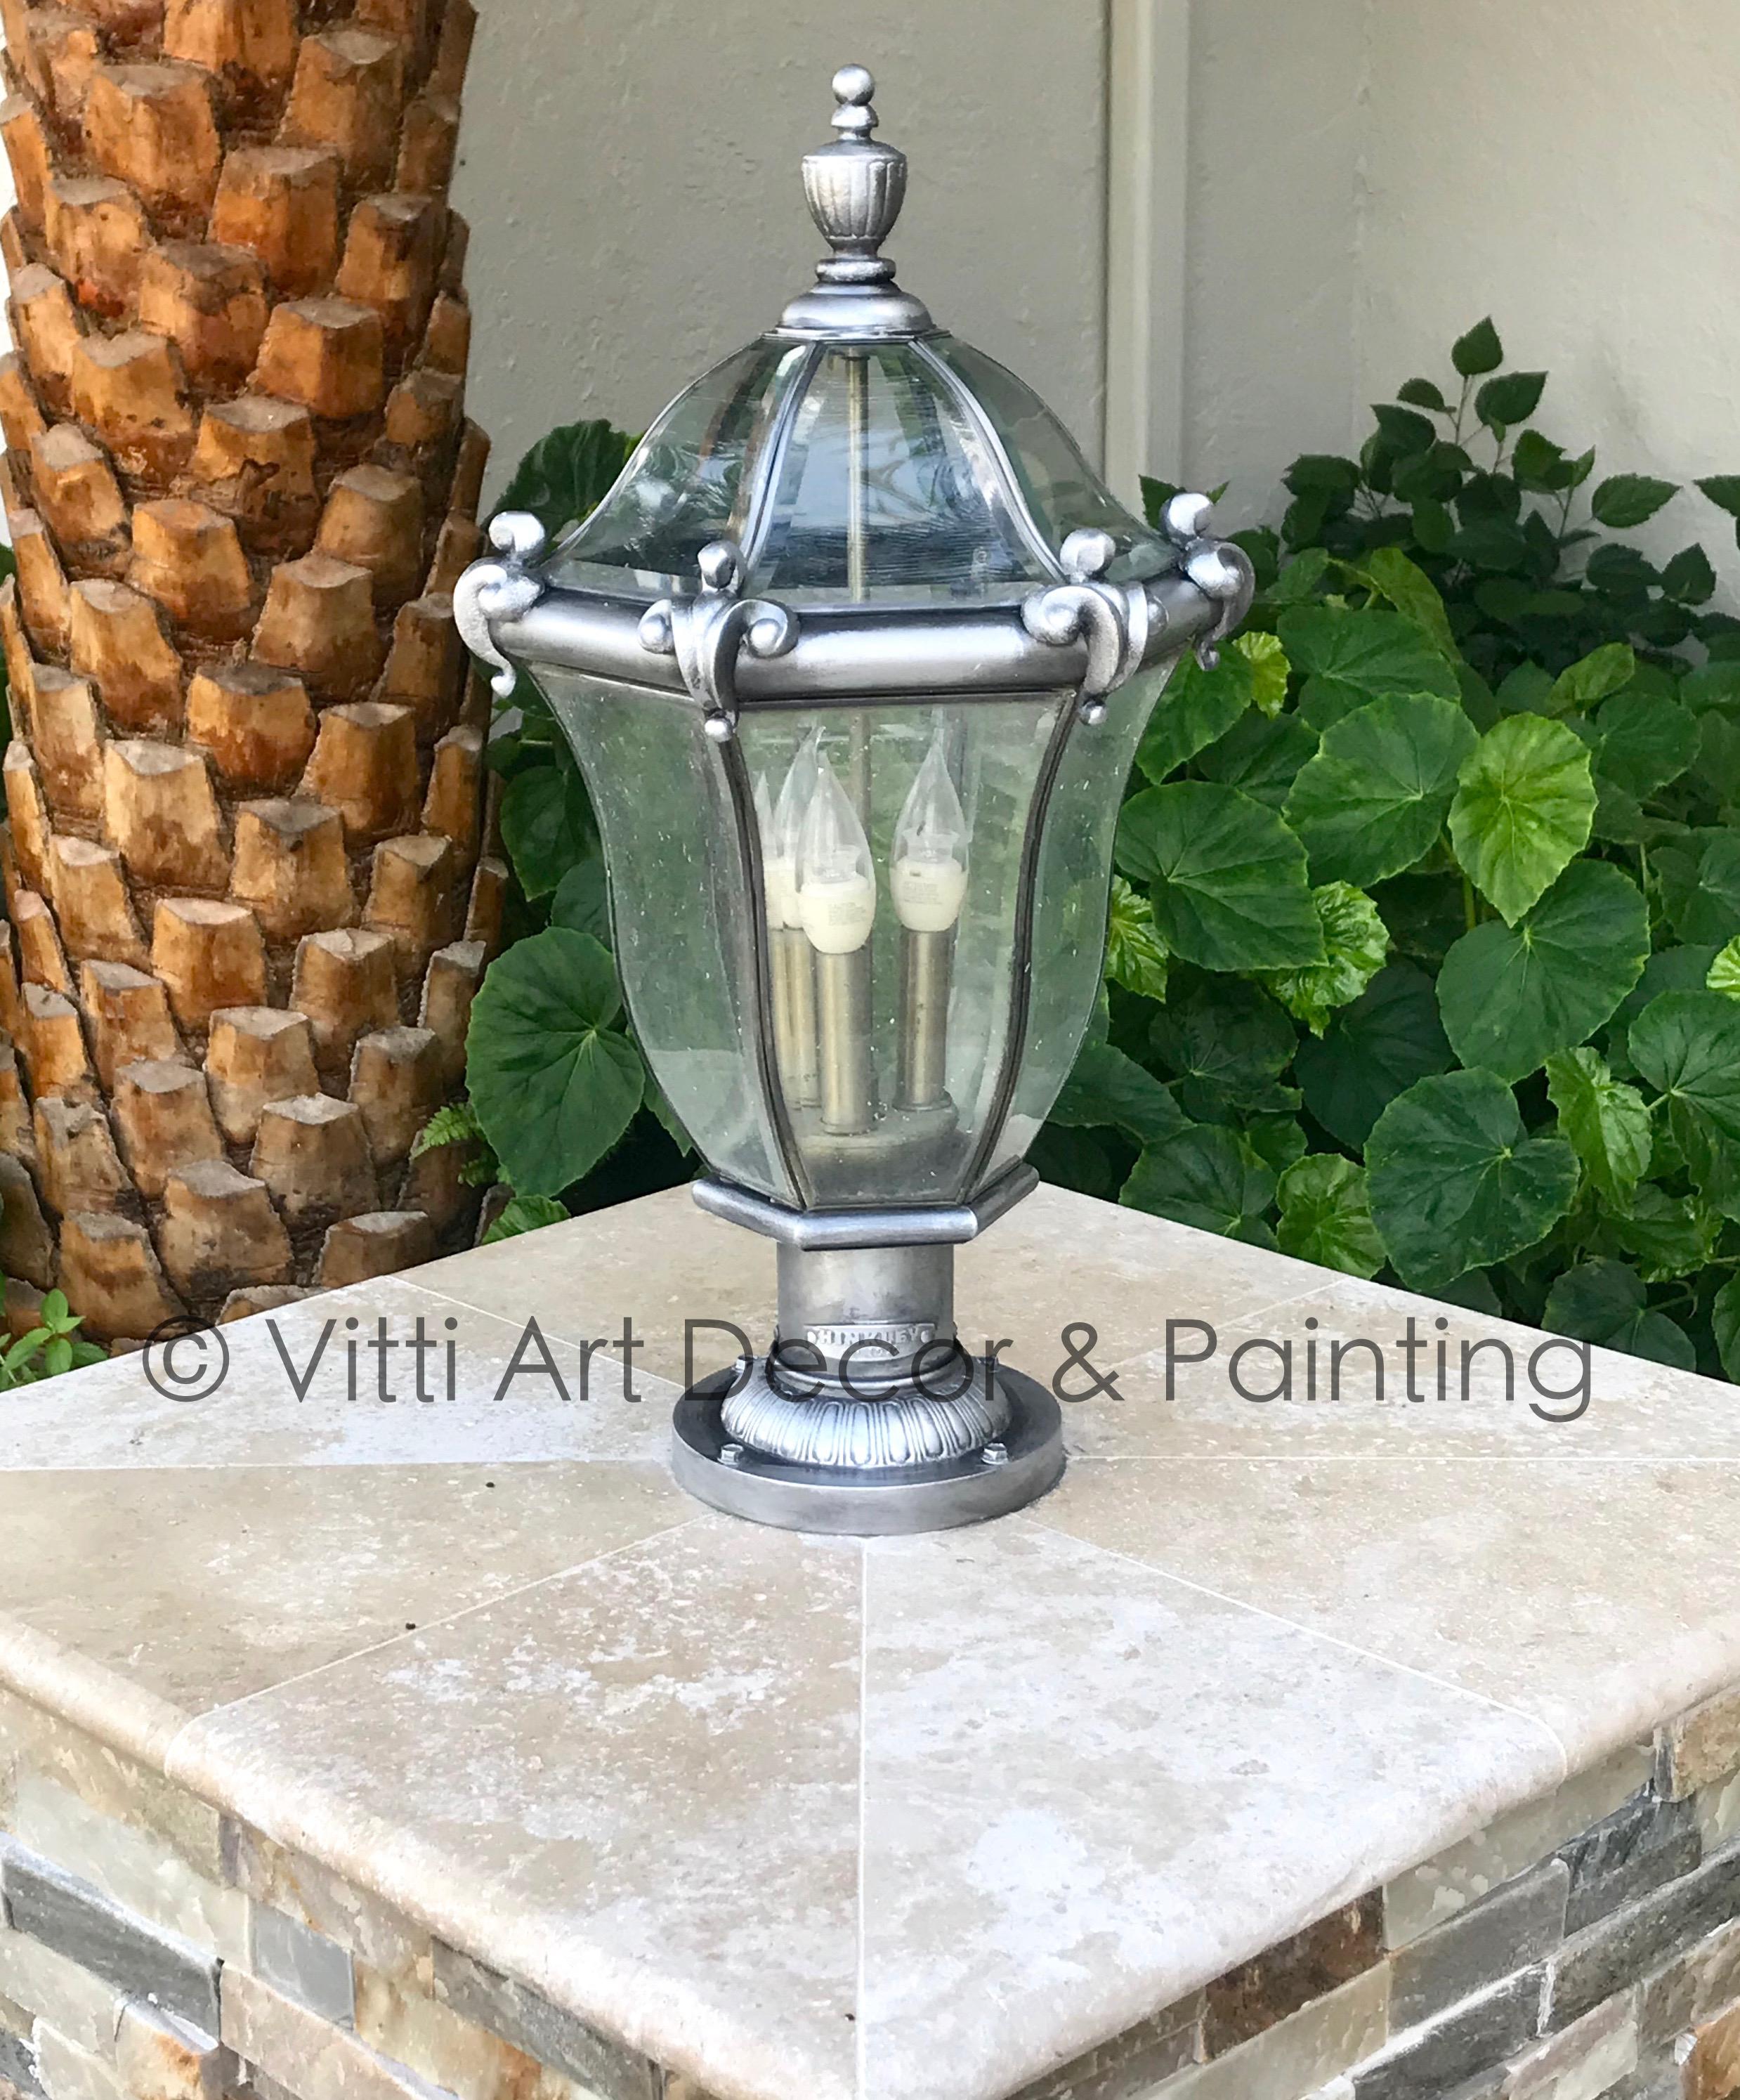 refinish chrome metallic finish exterior lighting fixtures jupiter florida paint faux